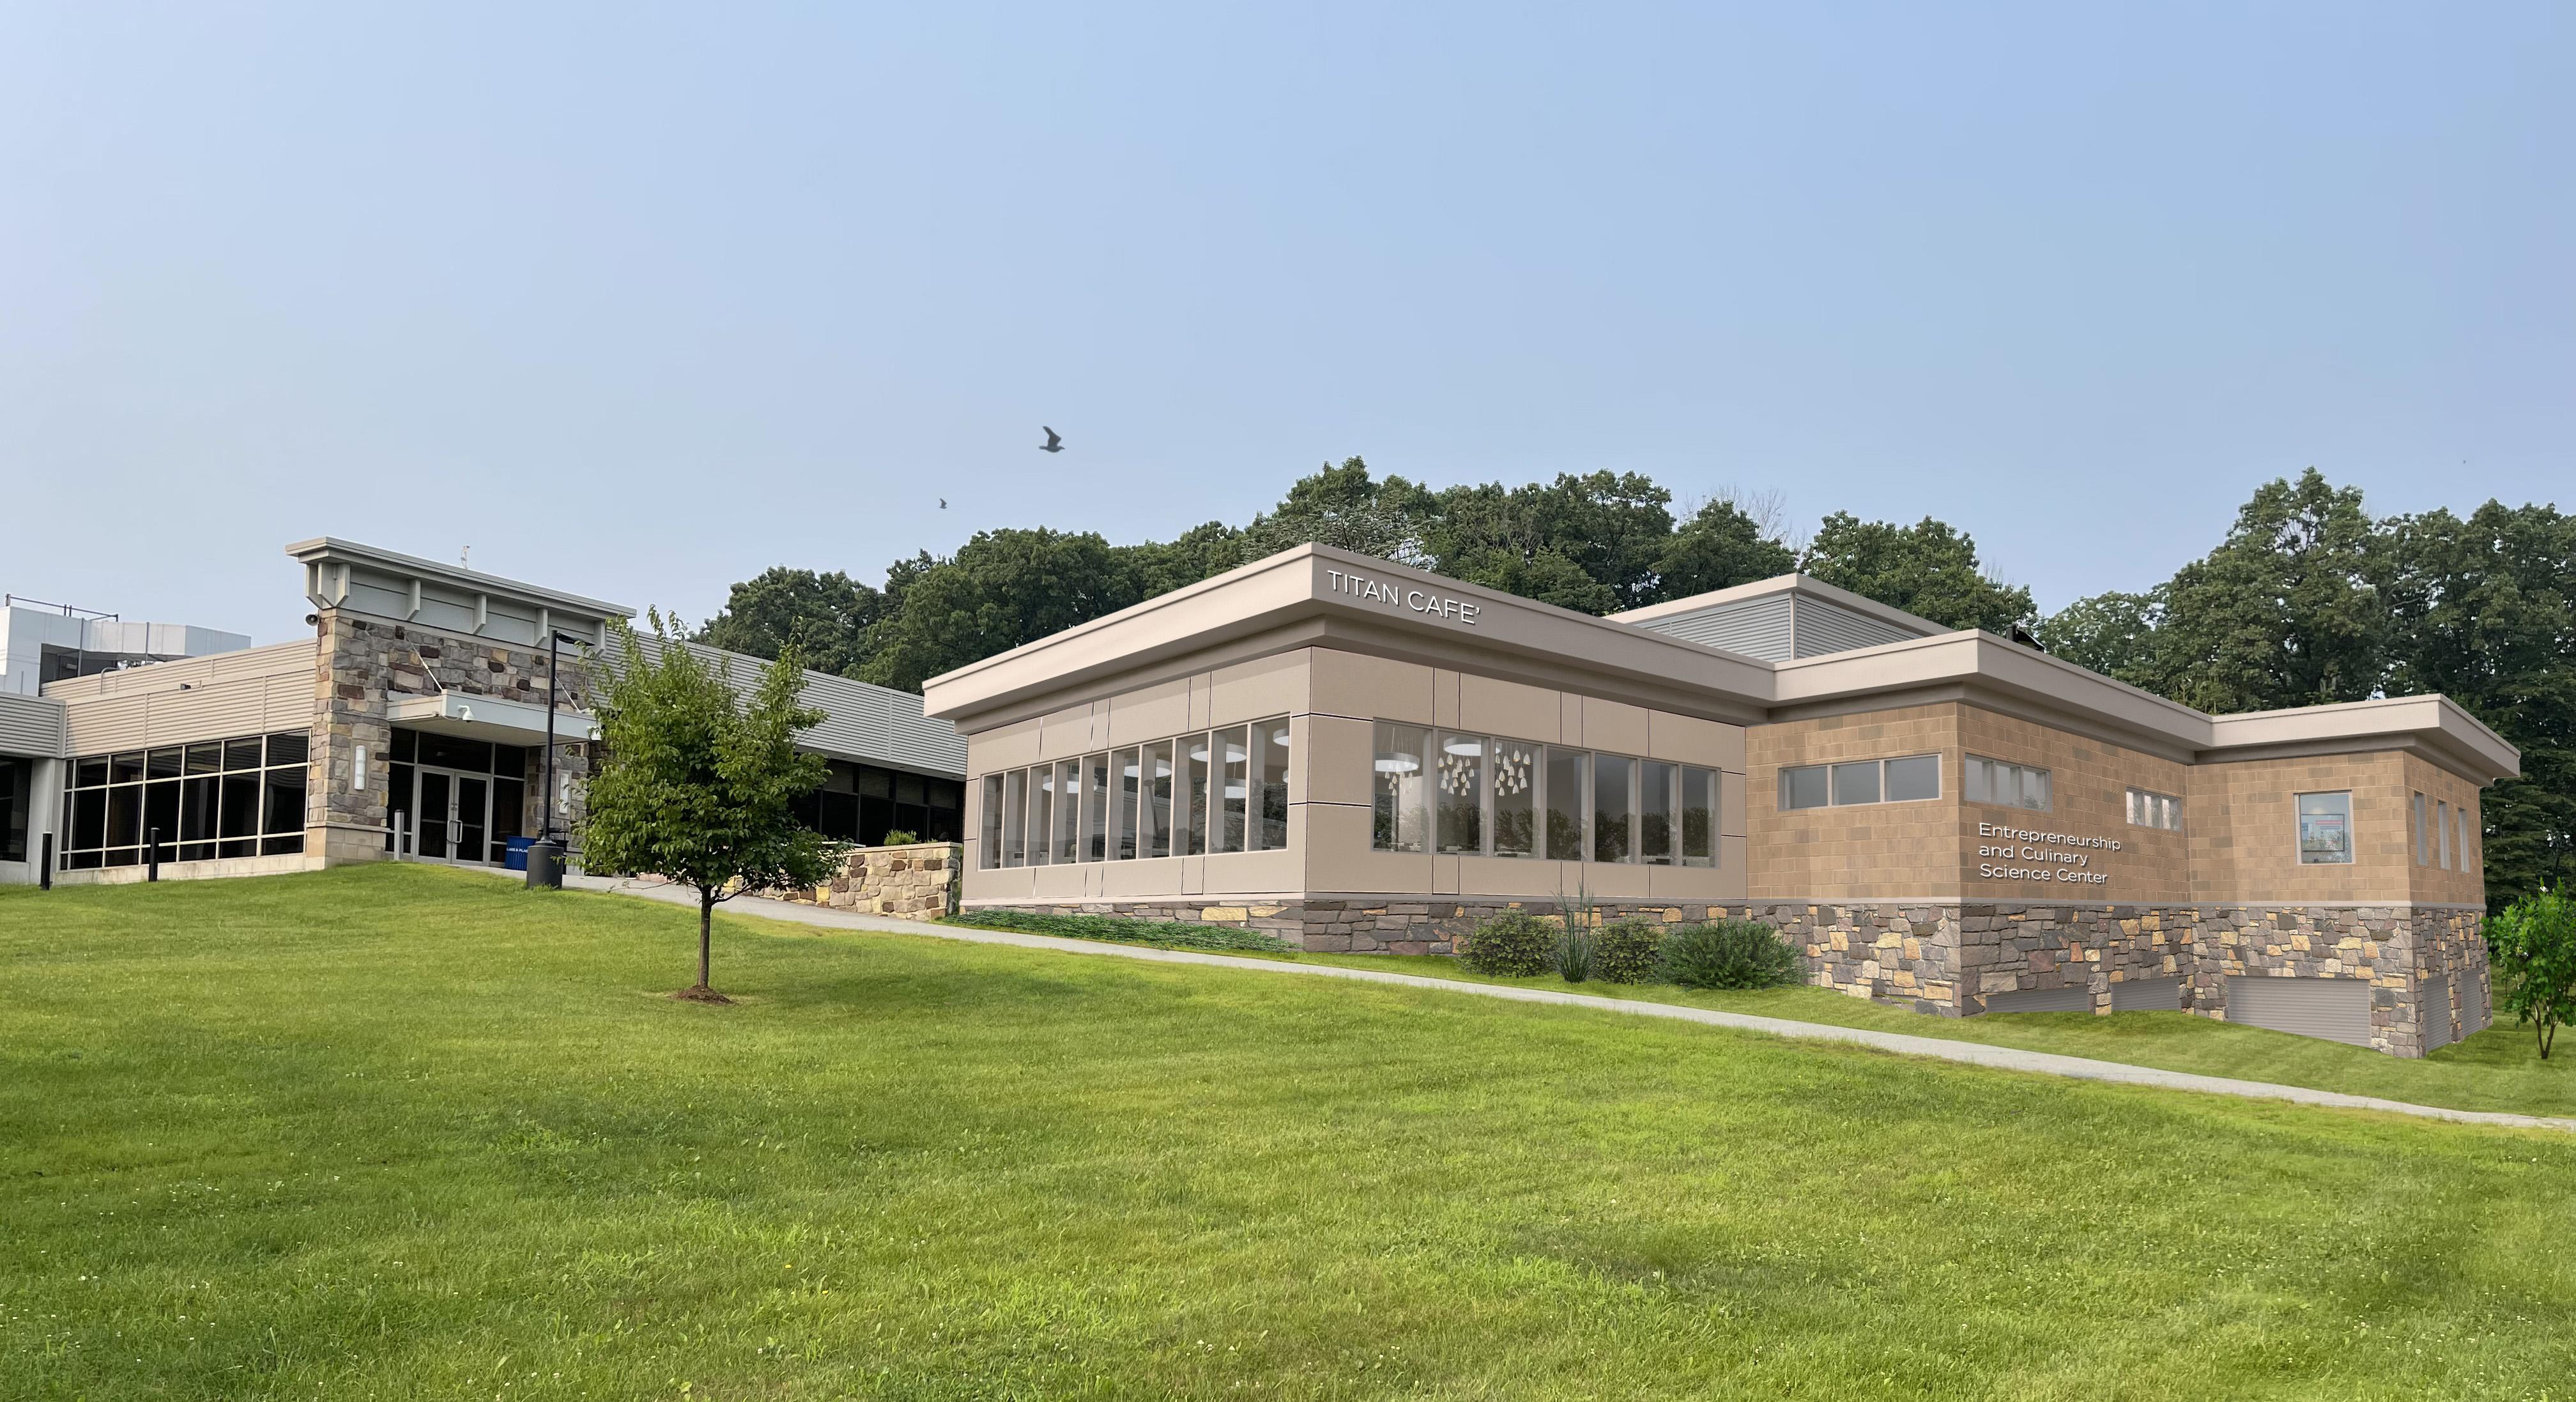 Rendering - 1L - Entrepreneurship and Culinary Science Center.jpg